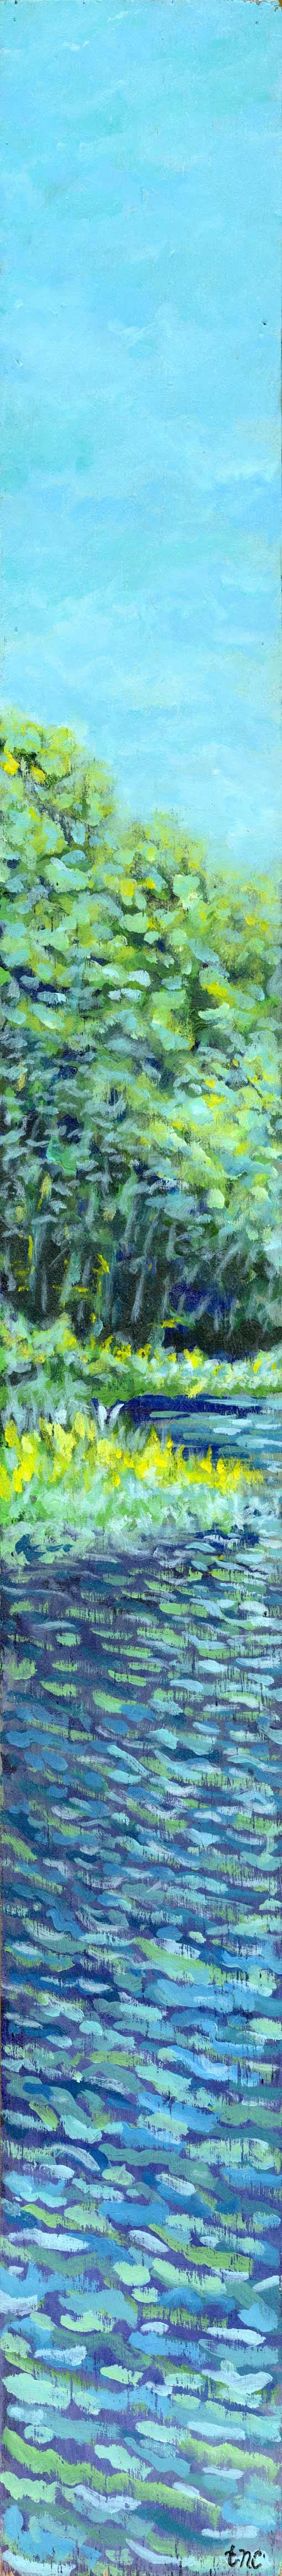 "Tall Pond • Framed 7x64"" • Original Acrylic Painting on Wood Panel"